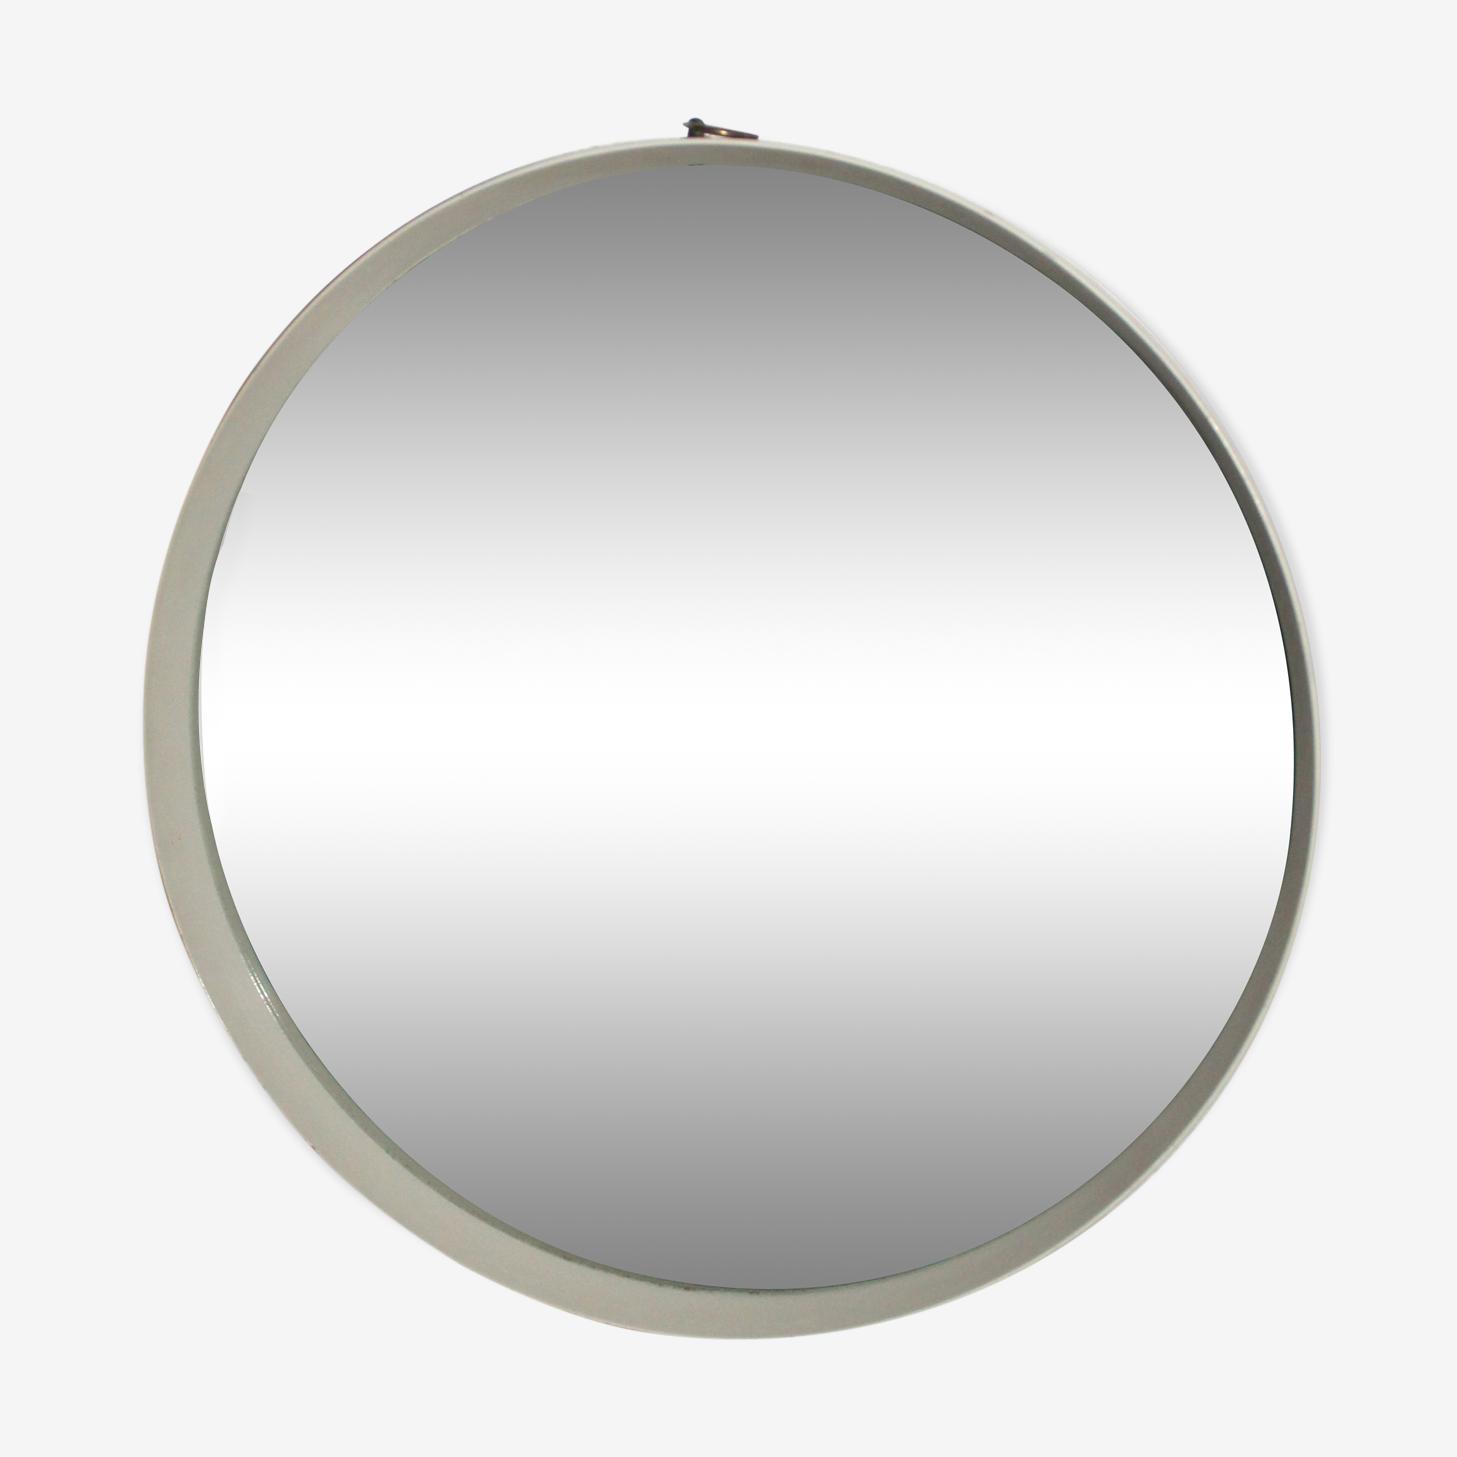 Former large mirror round vintage 60's D75cm wood